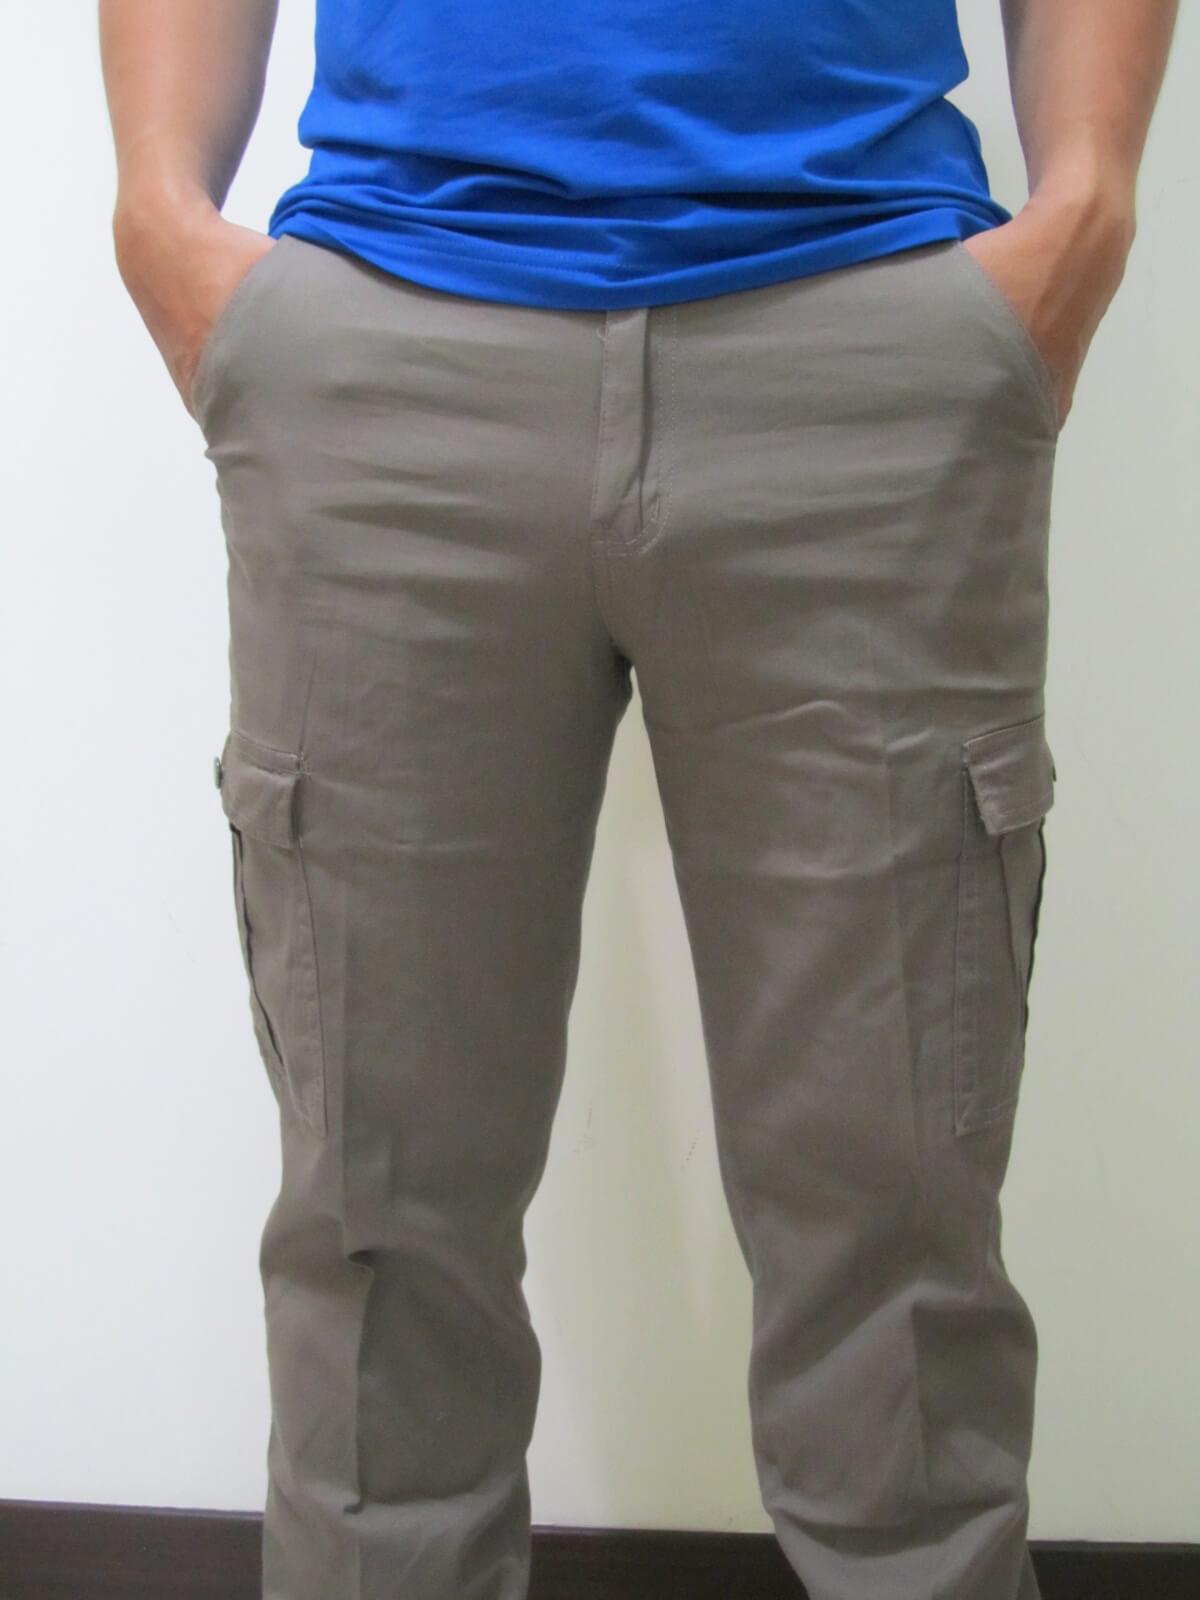 sun-e超輕薄休閒長褲、側貼袋工作褲、多口袋休閒長褲、伸縮中直筒休閒長褲(307-7006-16)卡其 腰圍:M L XL LL 3L 4L 5L(28~41英吋) 1